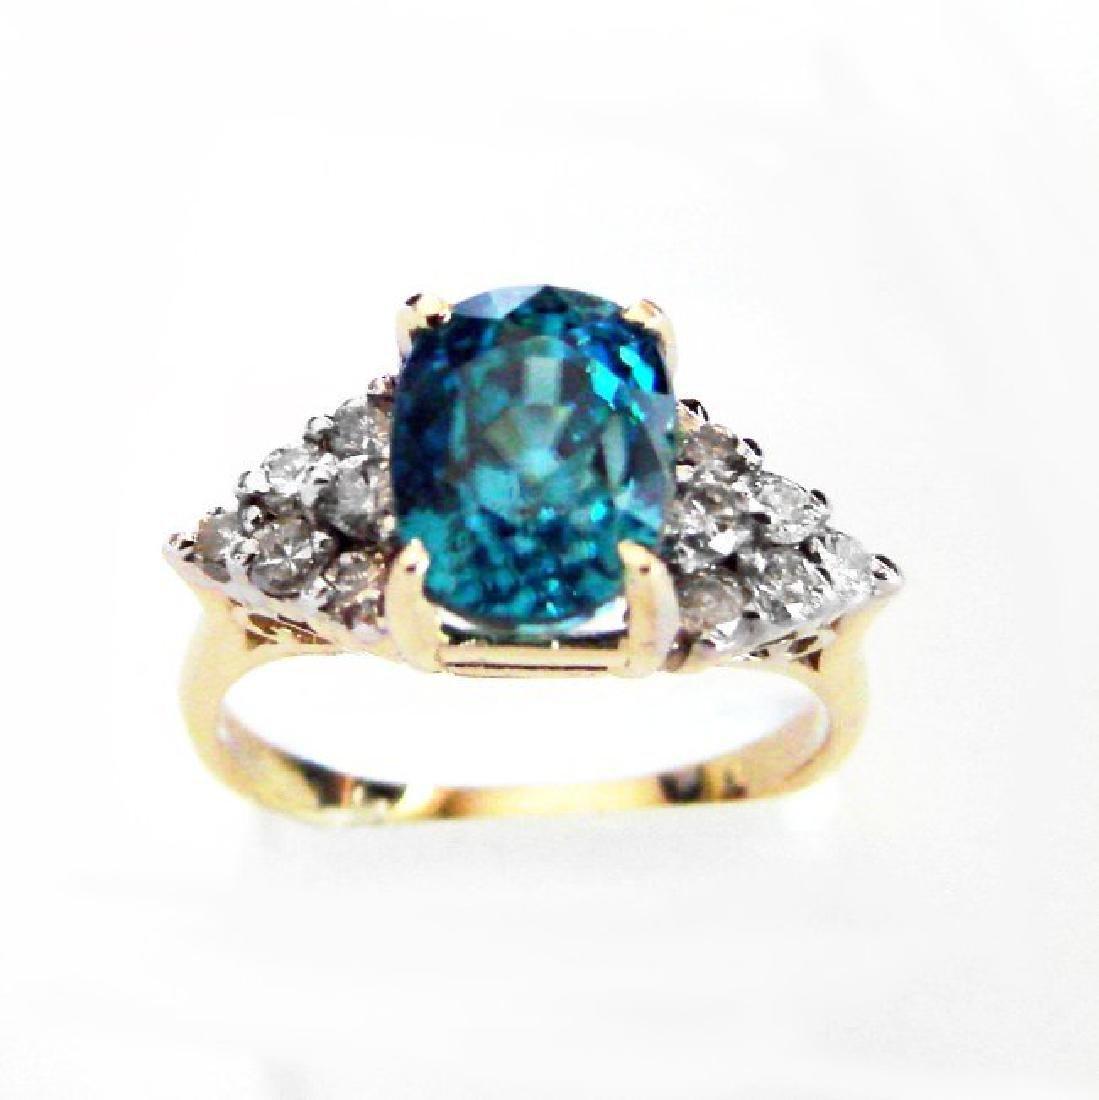 Natural Blue Zircon Diamond Ring: 5.84Ct 14k Y/g - 2